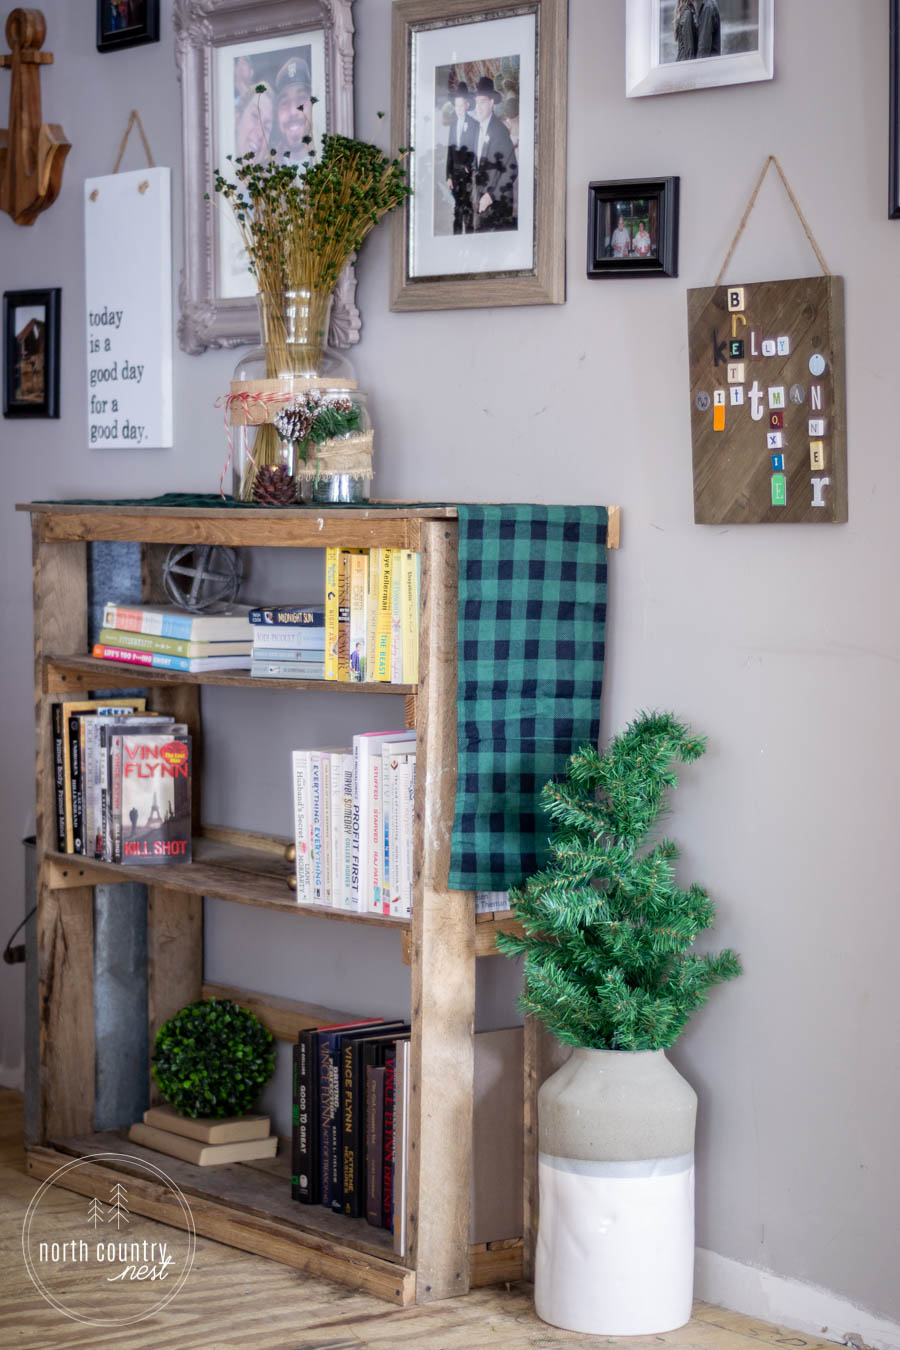 holiday decor and book shelf